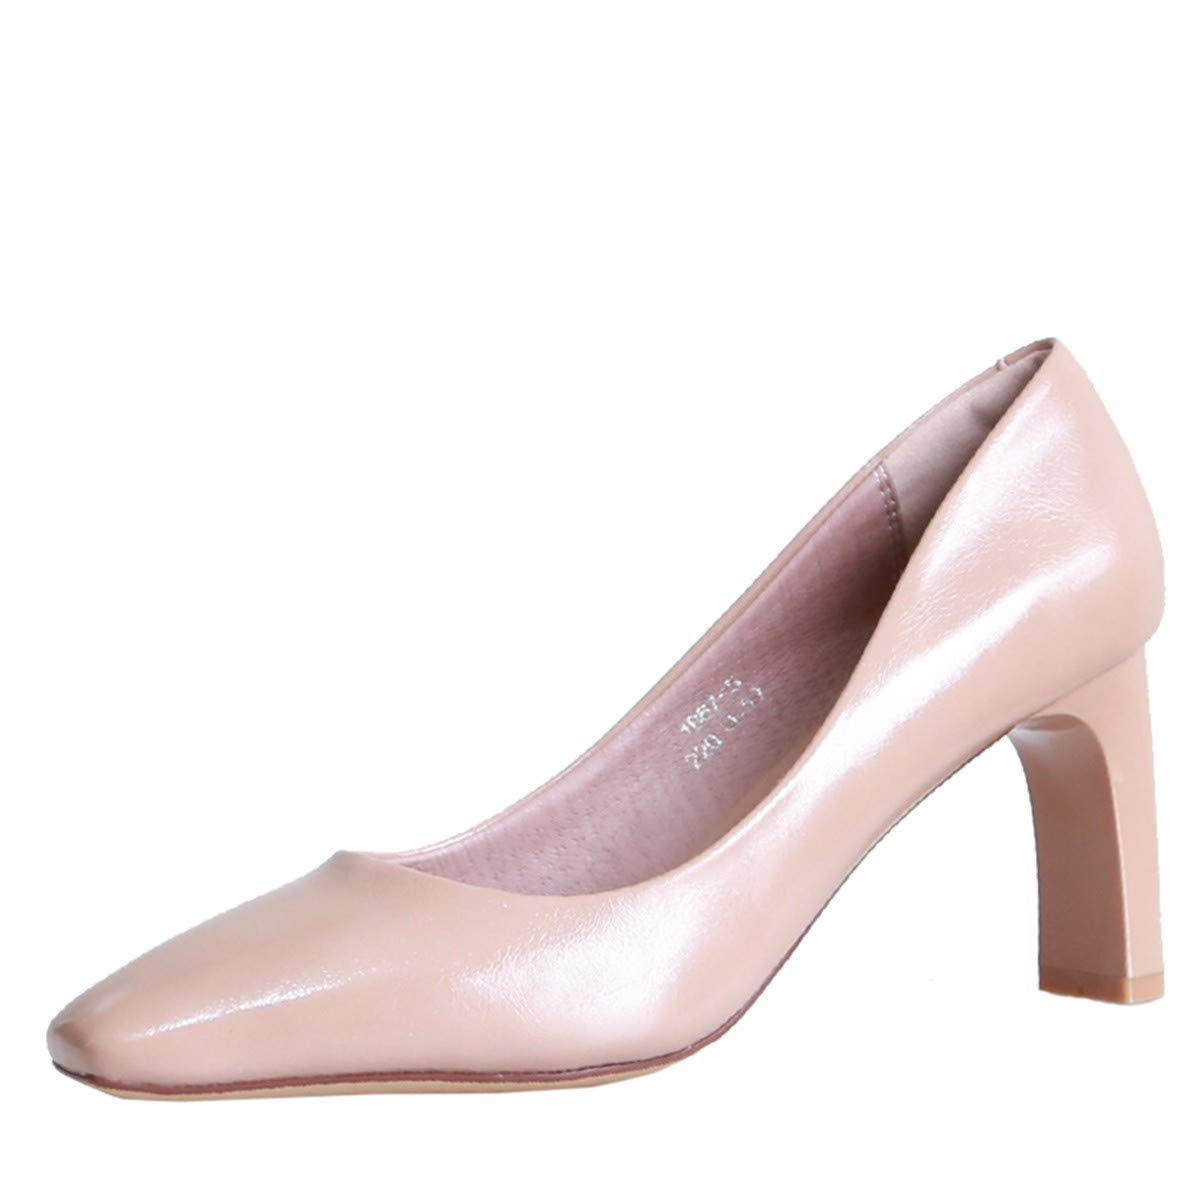 KPHY Damenschuhe Herbst Sexy Dicke Dicke Dicke Sohle 7Cm Hochhackigen Schuhe Einfache Square Kopf Flachen Mund Damenschuhe Dünnen Schuhen.38 Aprikosen-Farbe 67da88